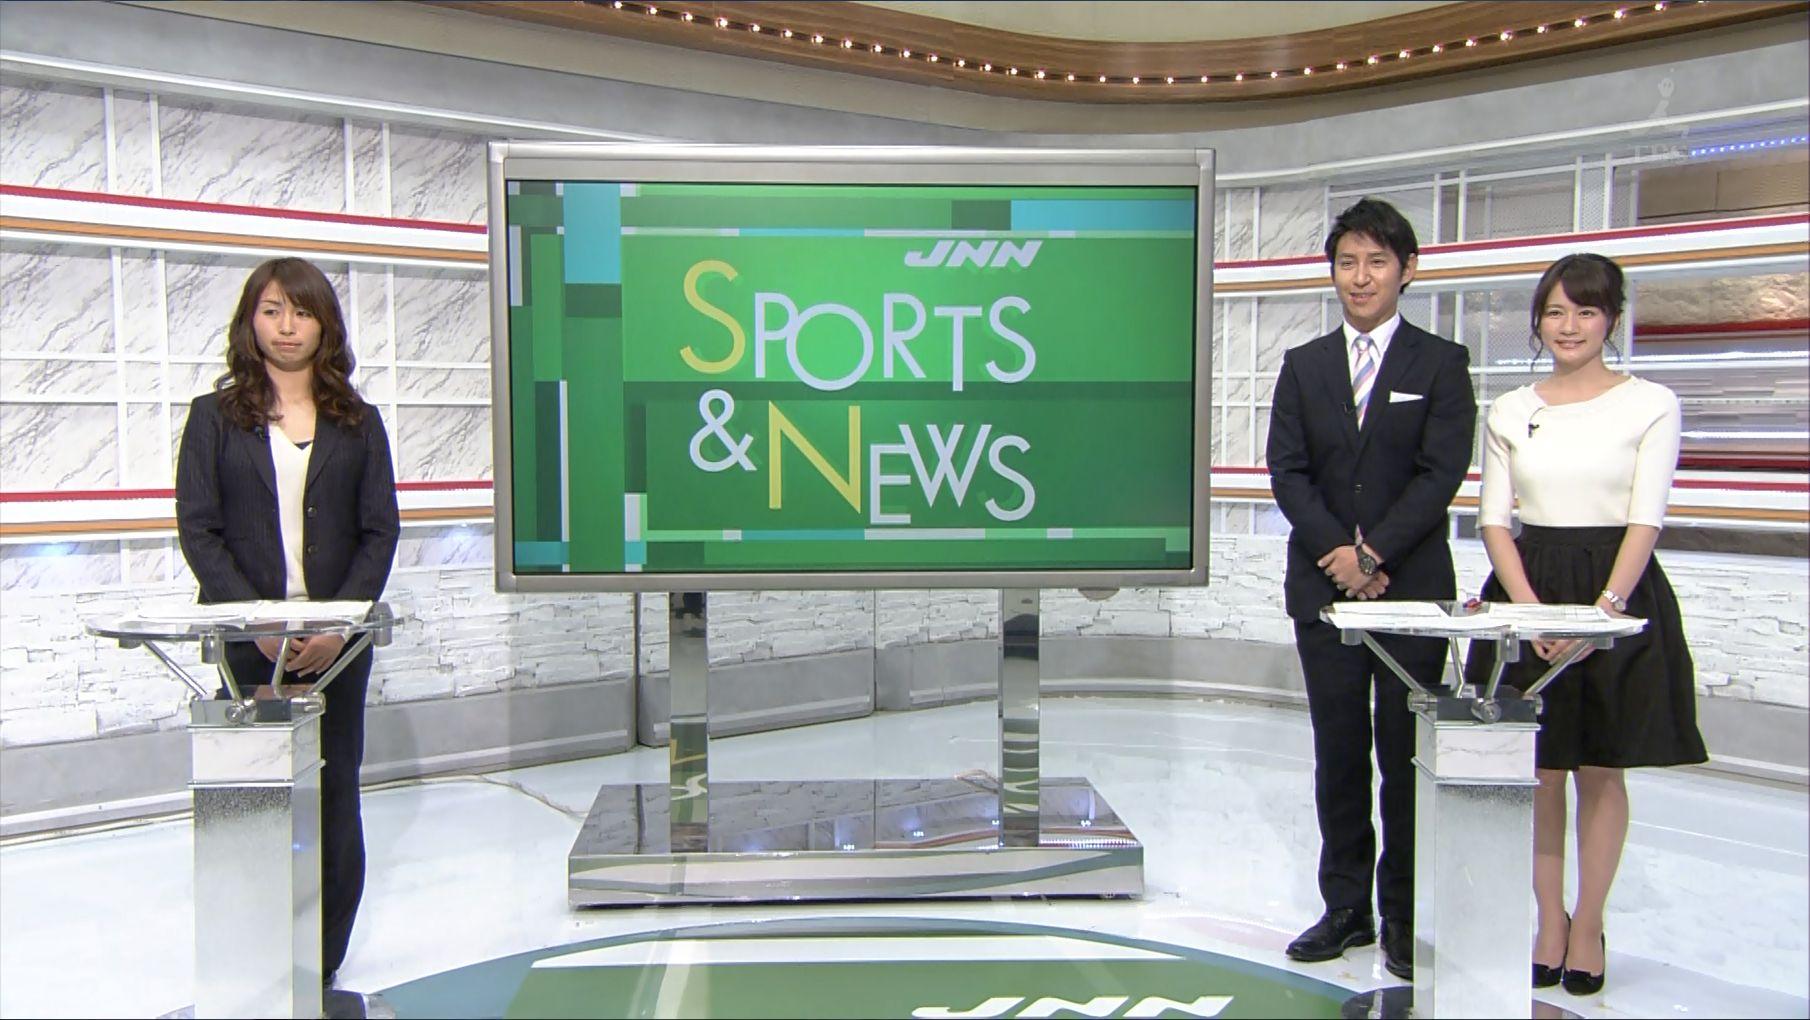 JNNスポーツ&ニュース